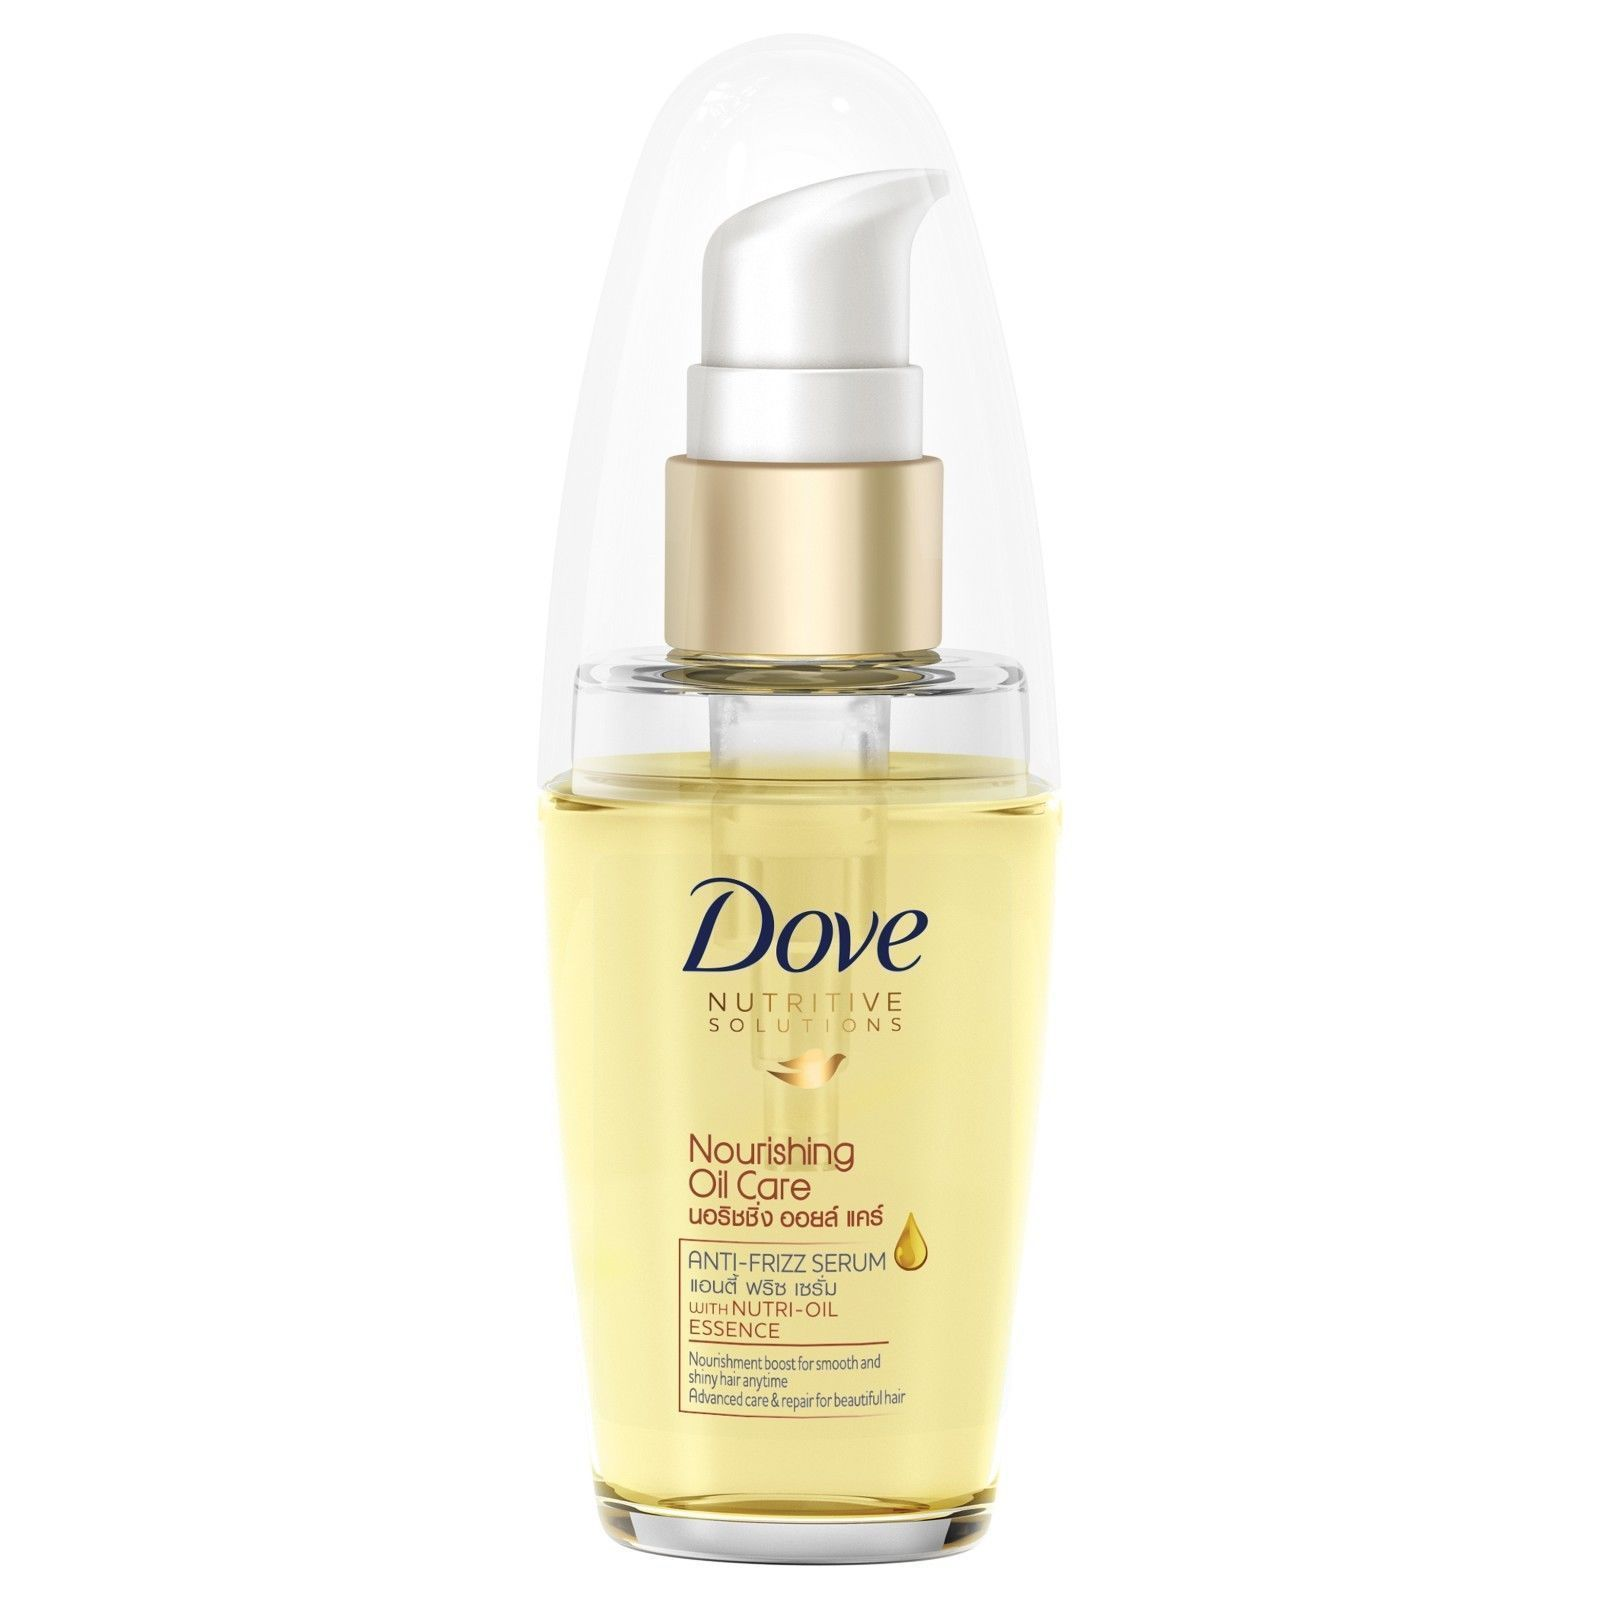 Dove Nourishing Oil Care Anti Frizz Hair Fall Rescue Serum 40ml - $14.99